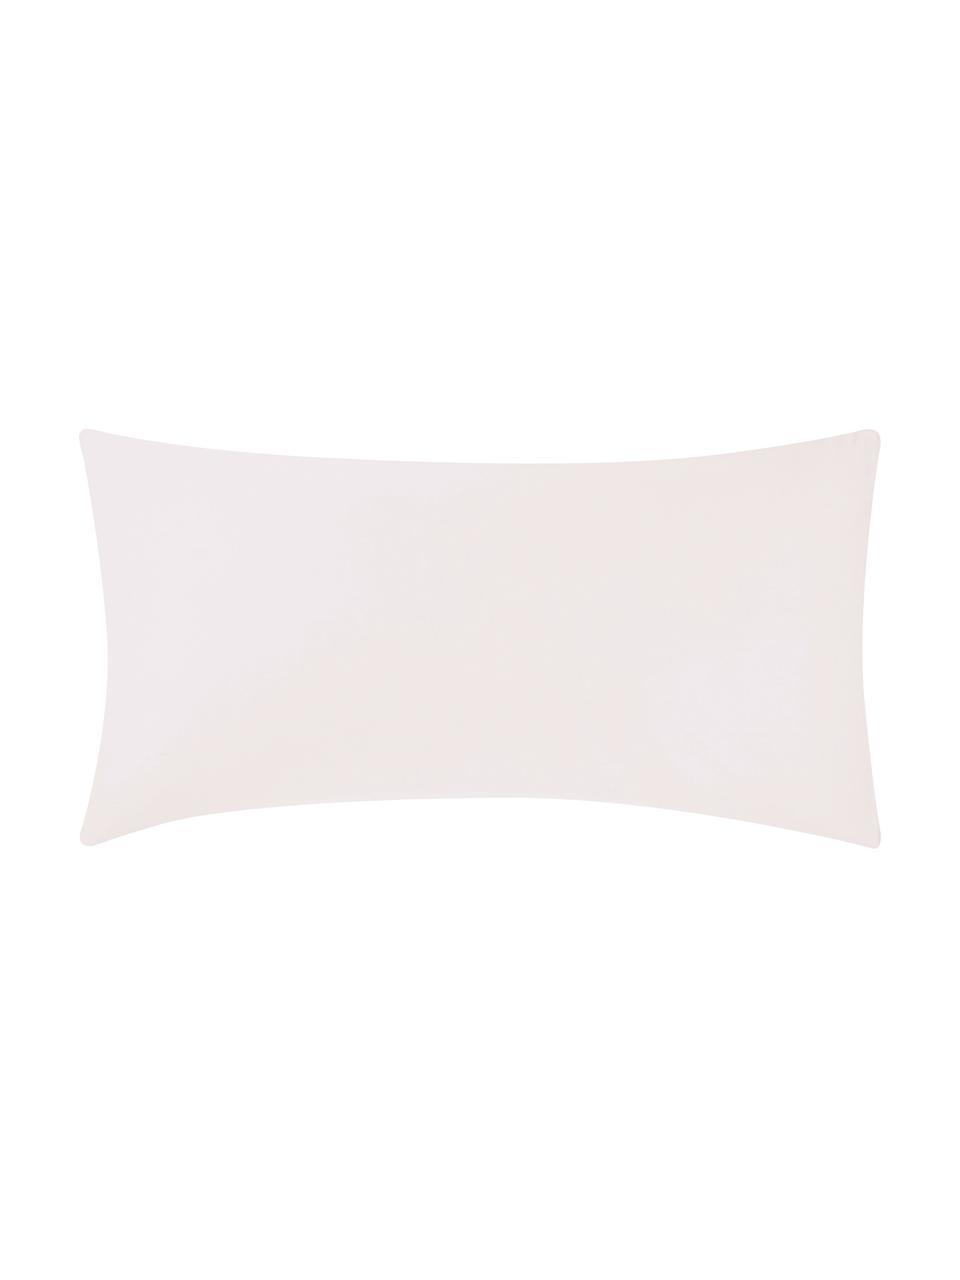 Baumwollsatin-Kopfkissenbezüge Comfort in Rosa, 2 Stück, Webart: Satin Fadendichte 250 TC,, Rosa, 40 x 80 cm